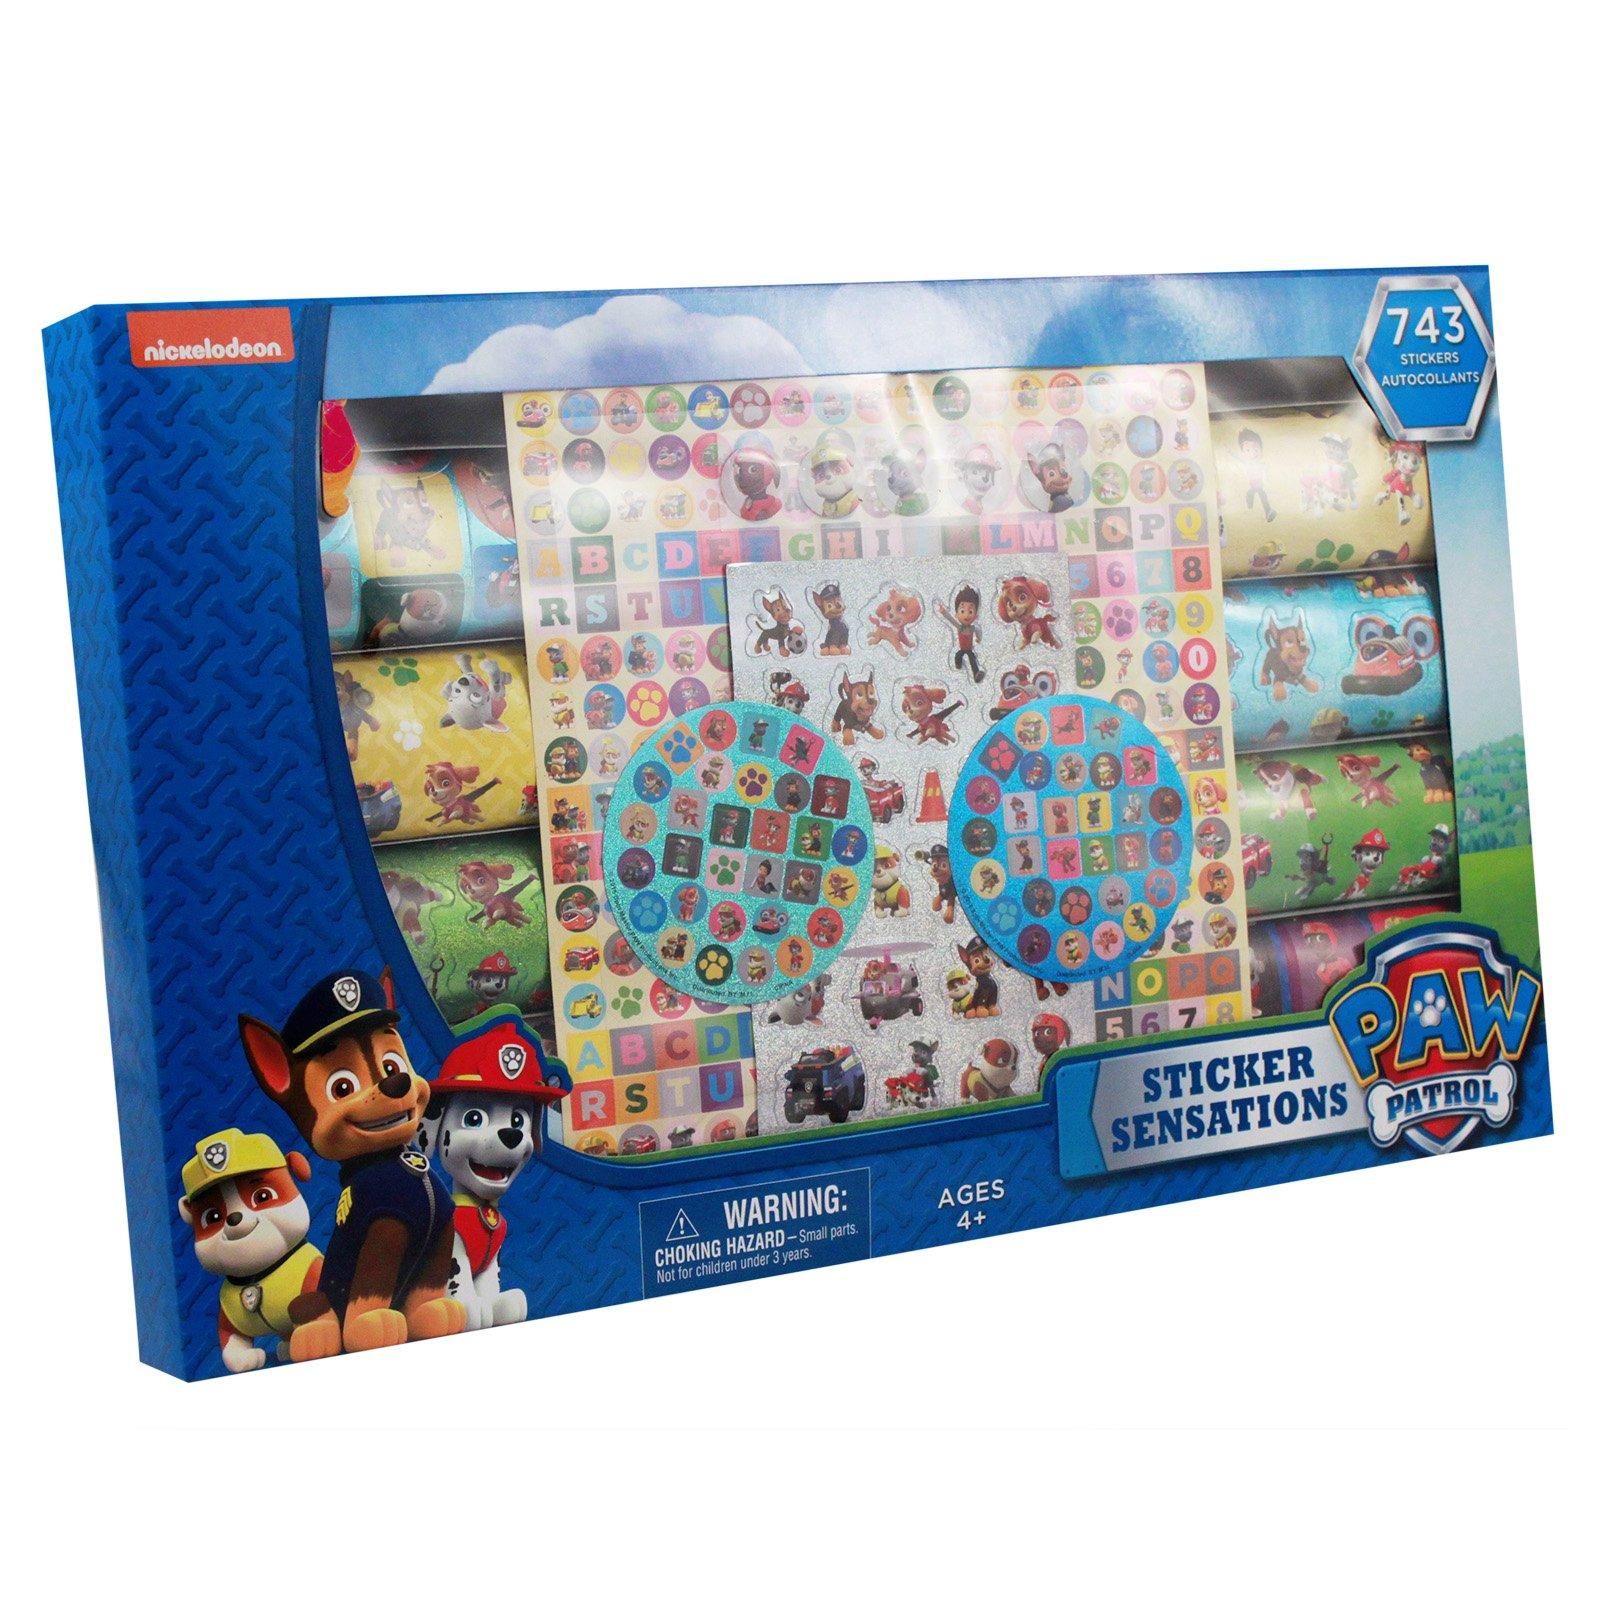 450pc Nickelodeon Paw Patrol Sticker Mania Set Kids Arts and Crafts